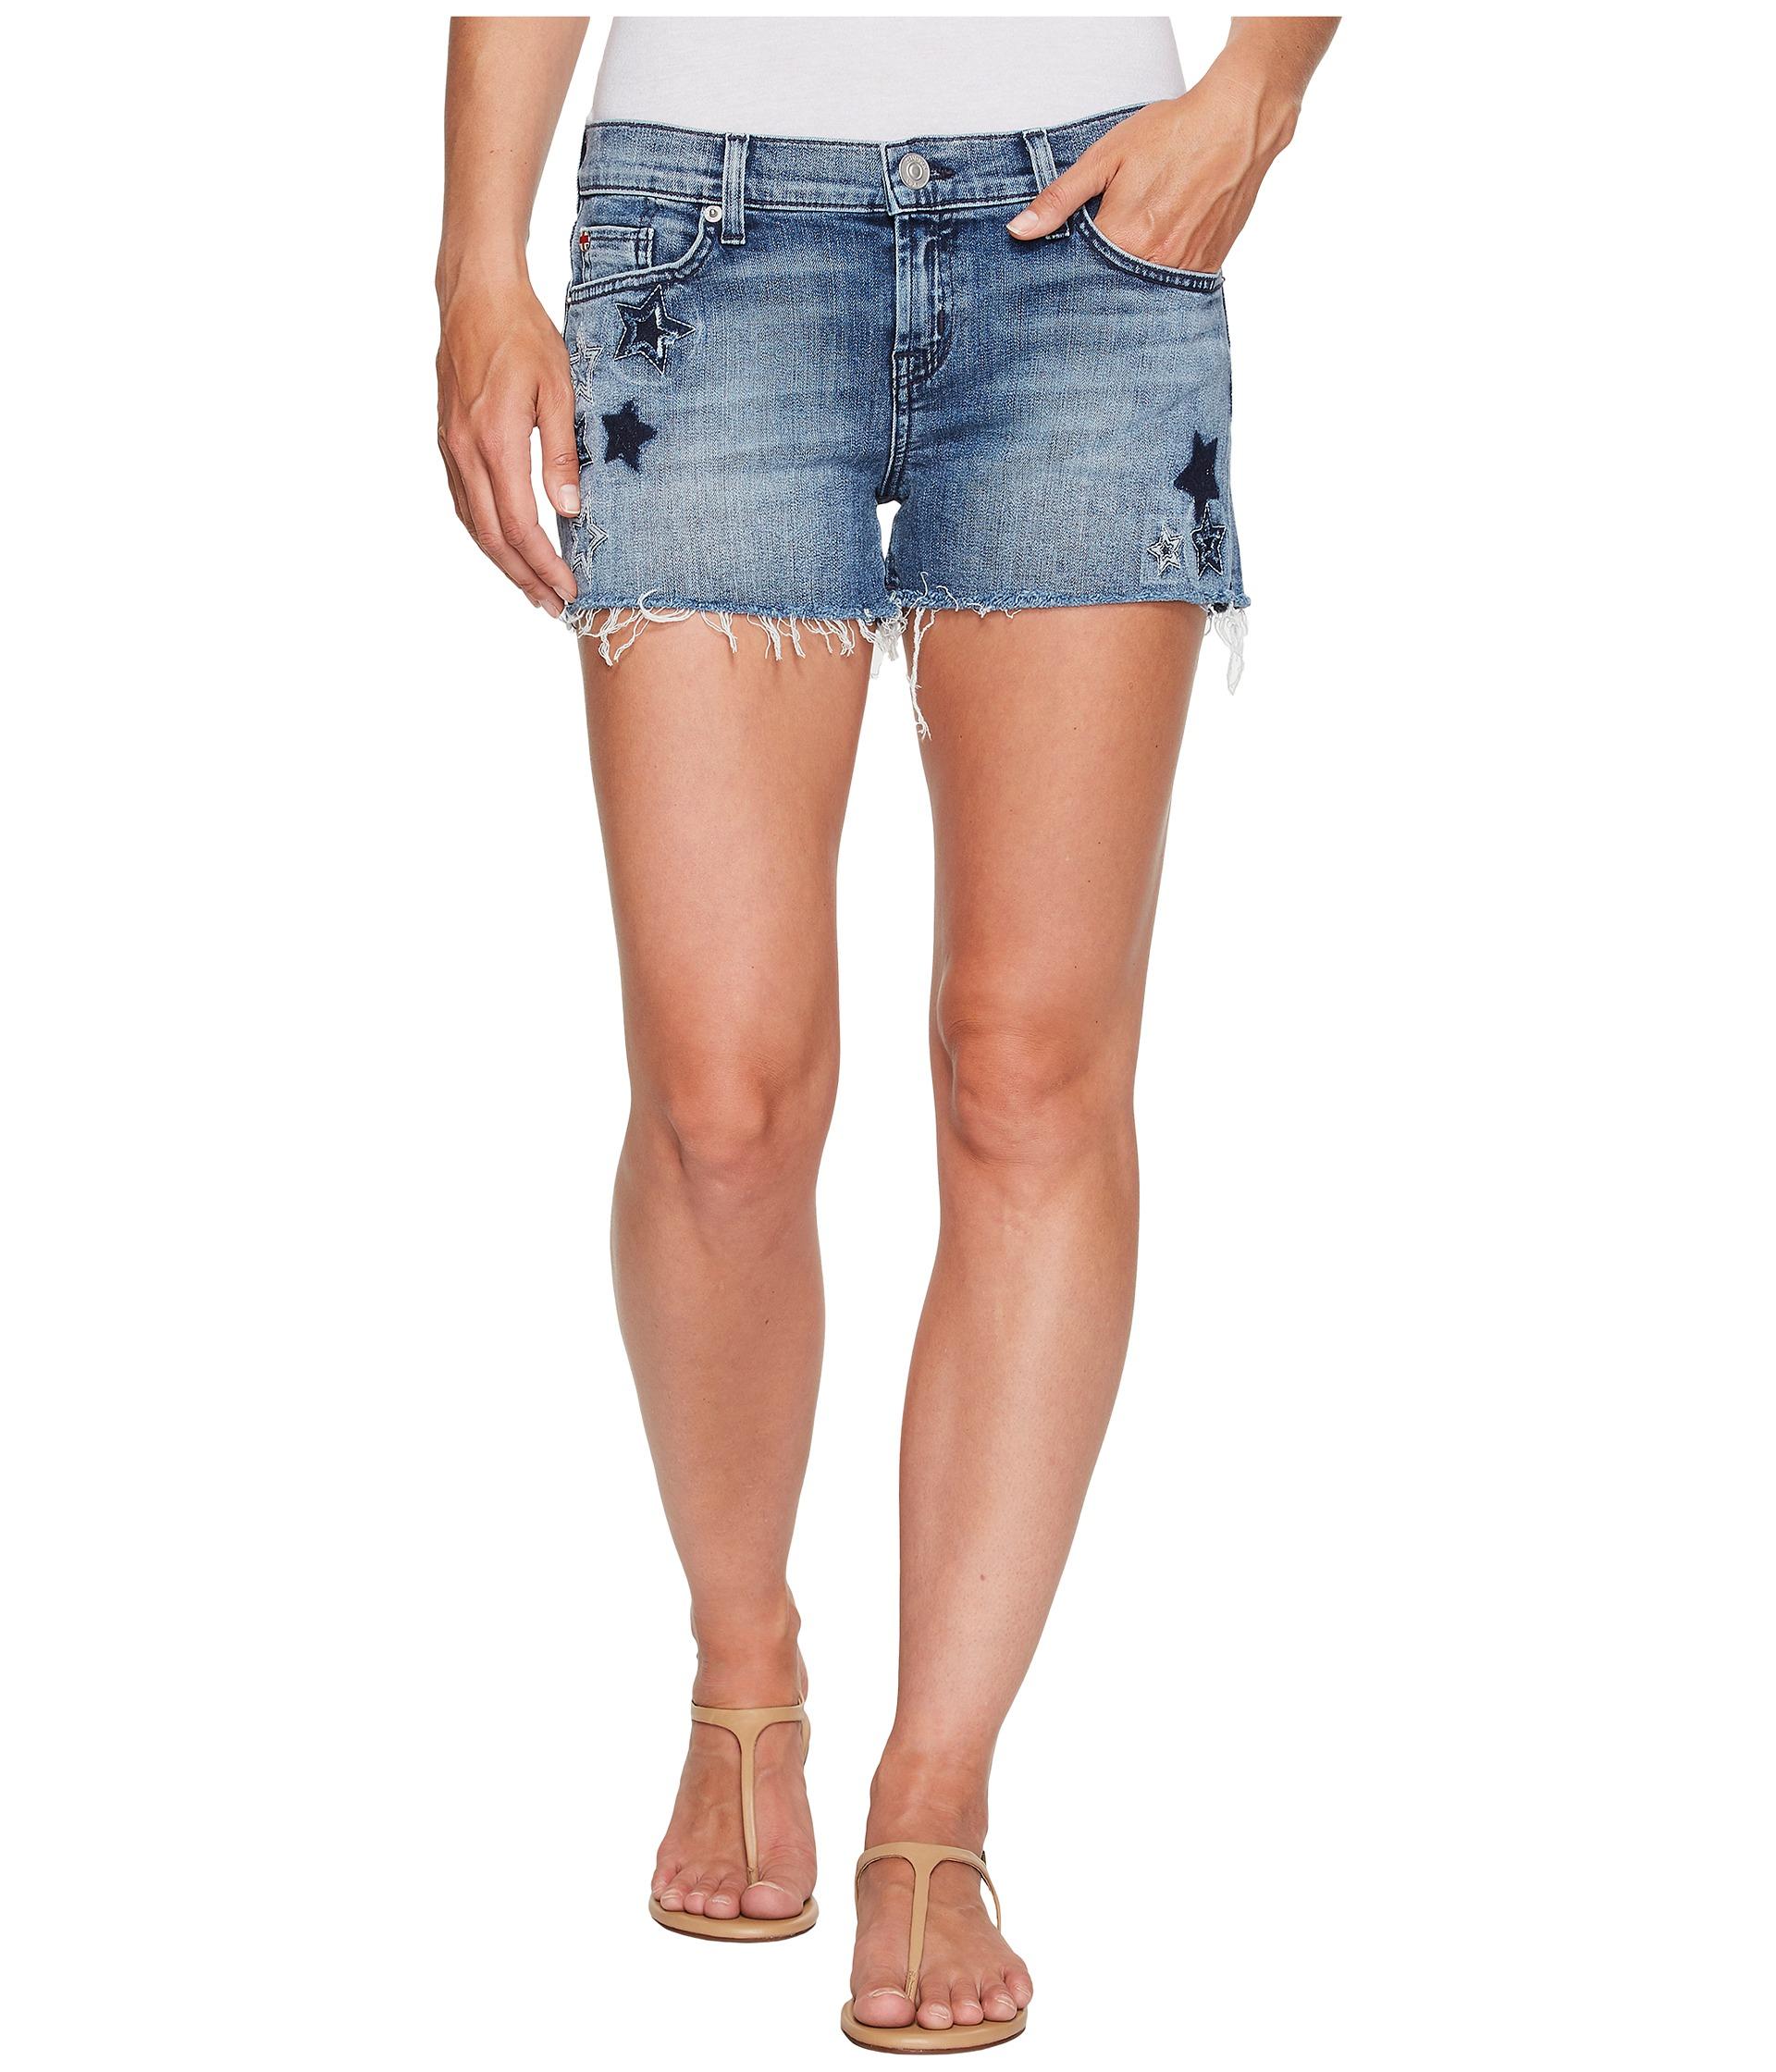 Clothing: Shop Clothes, Shipped Free | Zappos.com